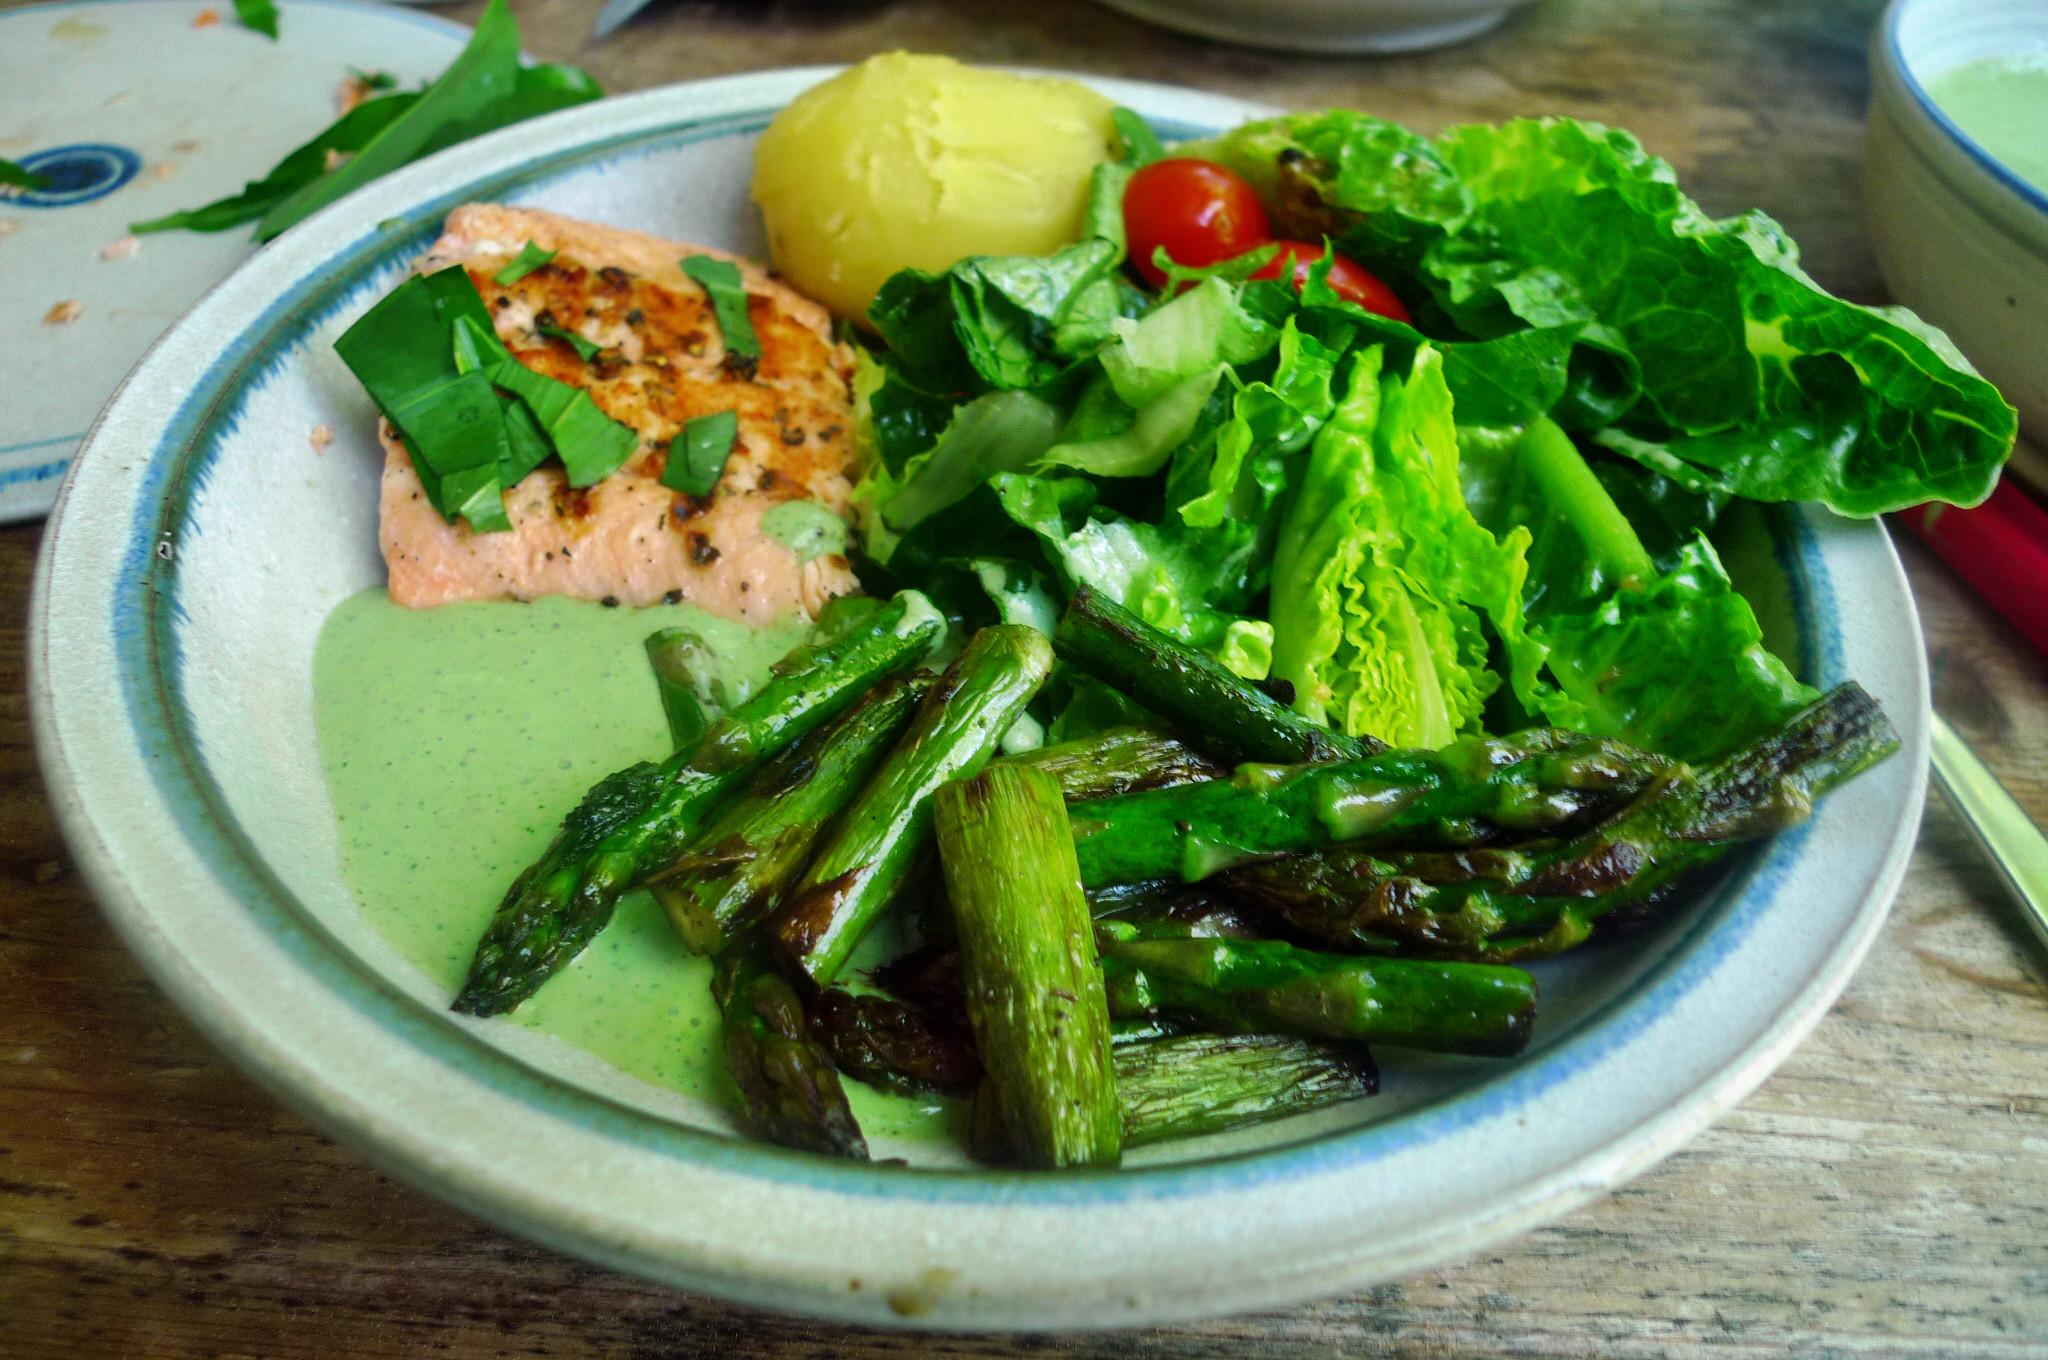 Lachs,Spargel,Dip,Salat,Kartoffel -10.5.15   (11)